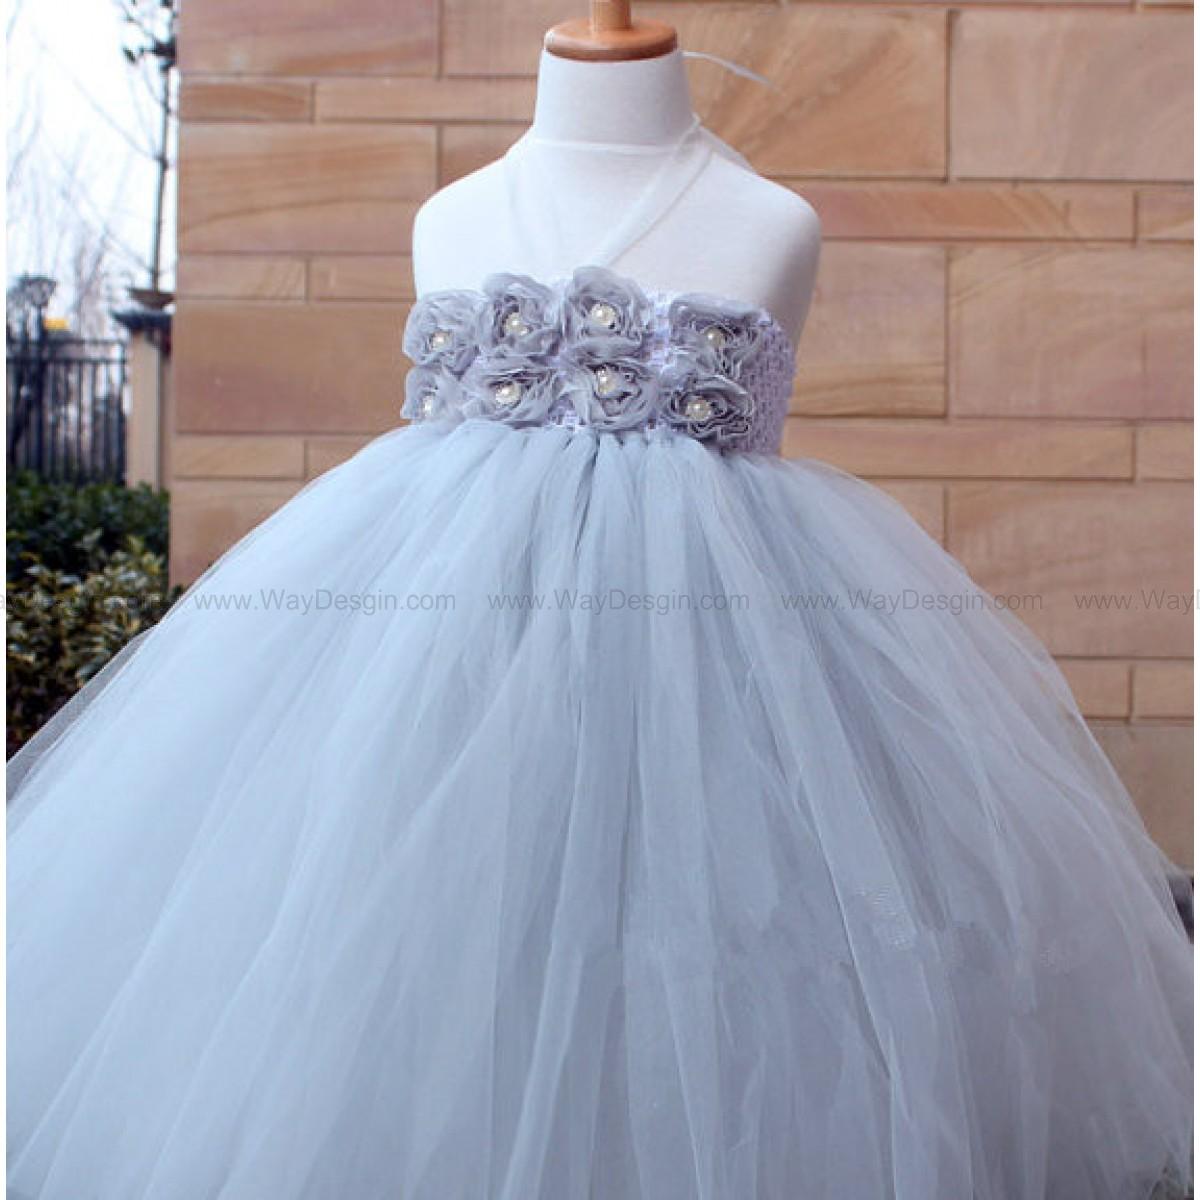 Grey Flower Girl Tutu Dress baby dress toddler birthday dress Baby wedding tutu dress Newborn